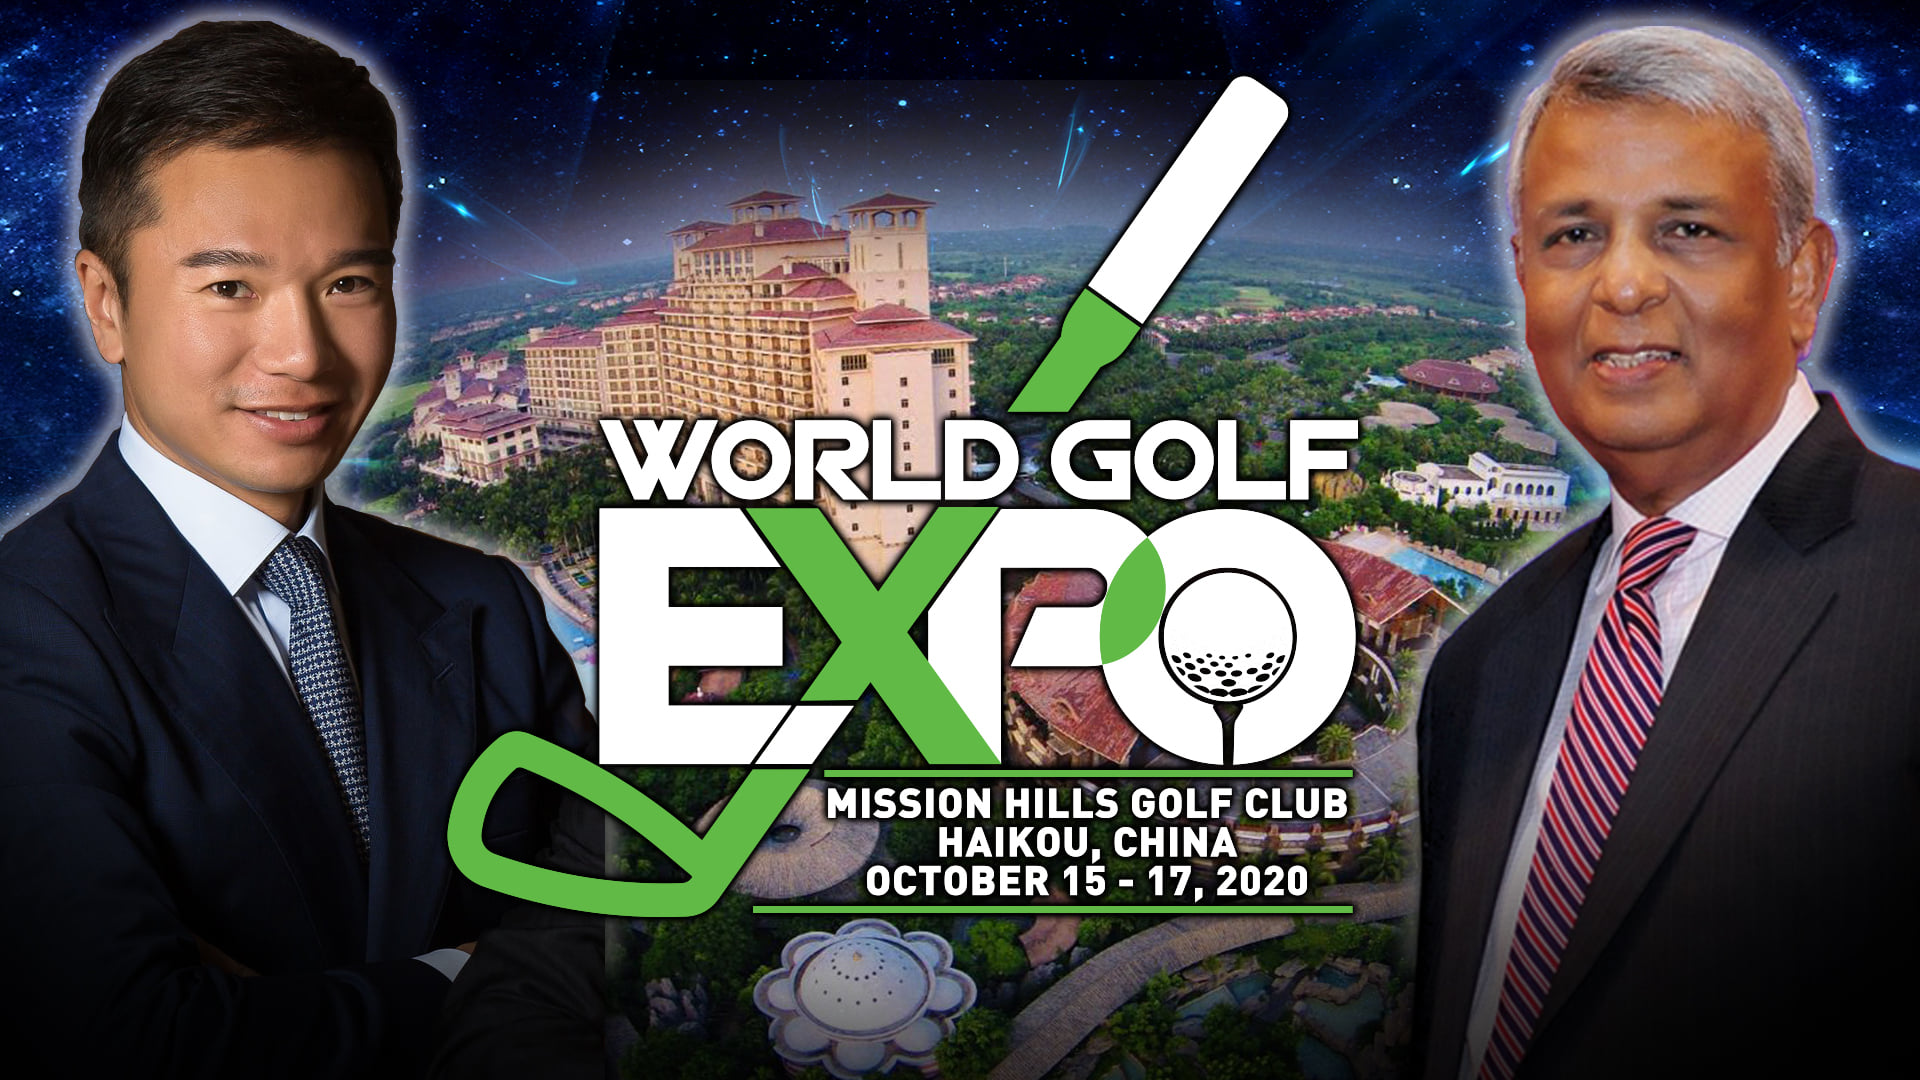 world golf expo